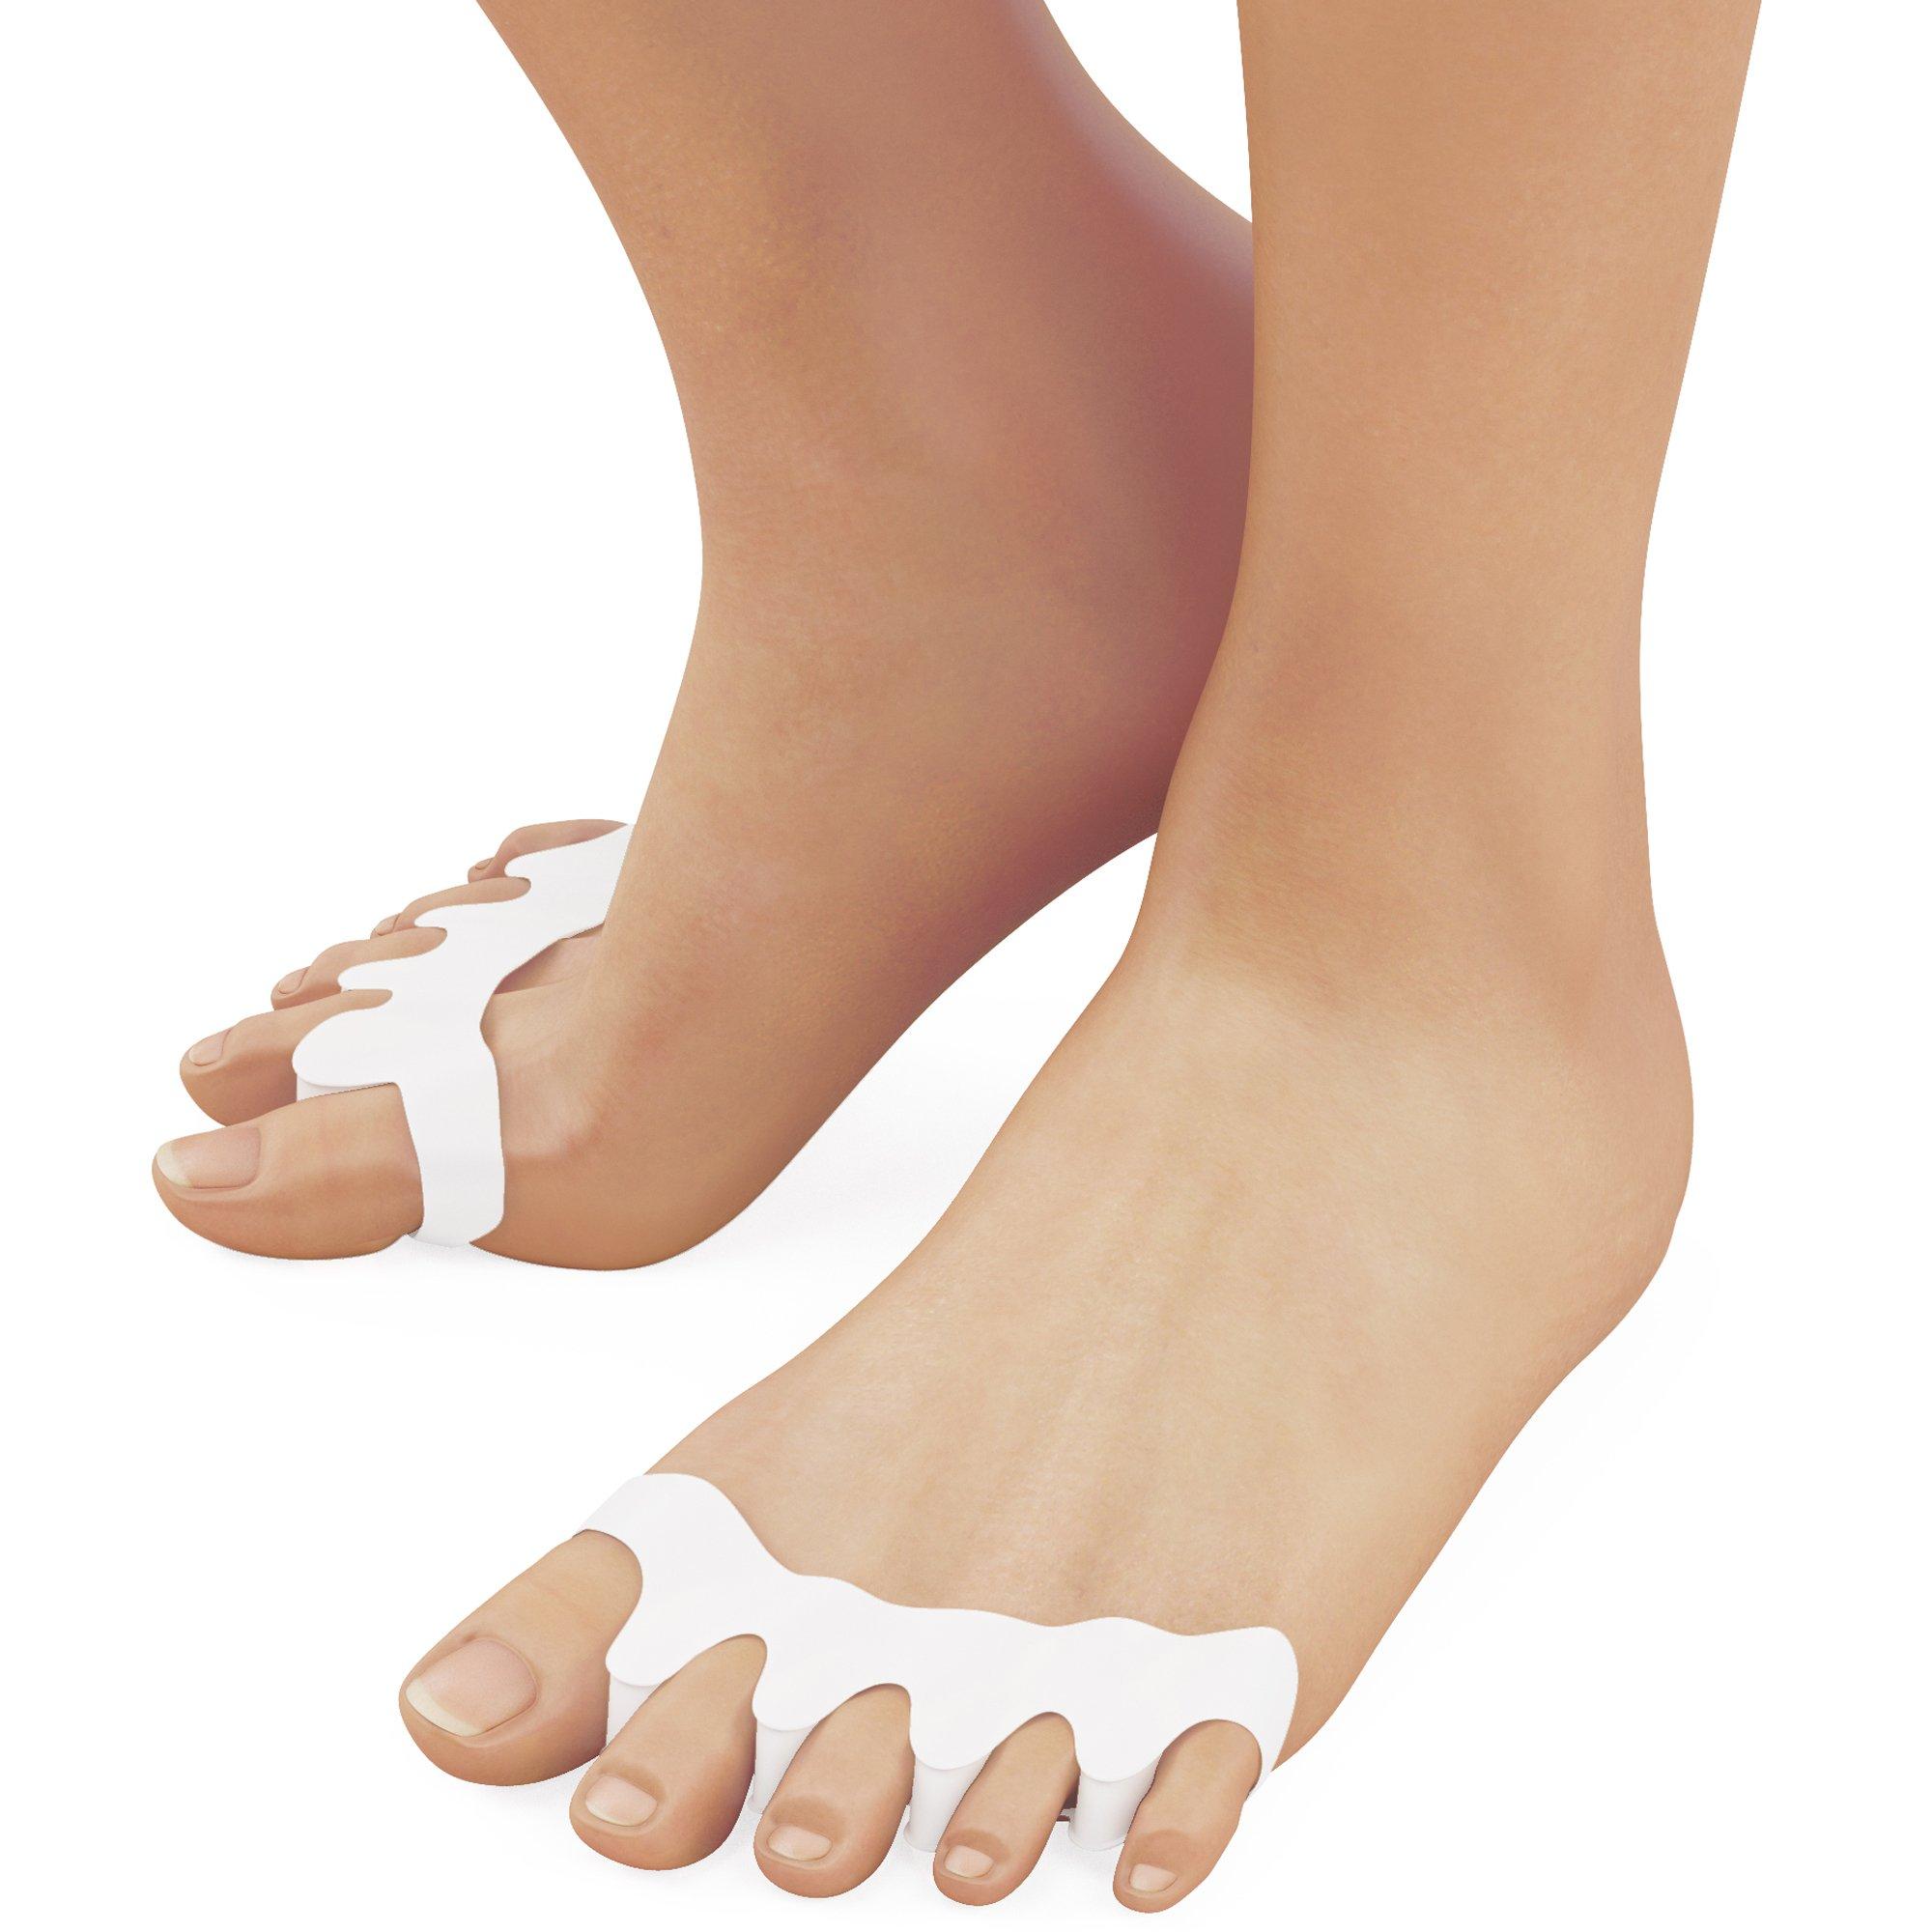 Toe Separators - Toe Straightener - Toe Spacers - Correct Toes - Gel Toe Separator - Toe Separators for Bunions - Hammer Toe Straightener - 3 Pairs - Ballotte